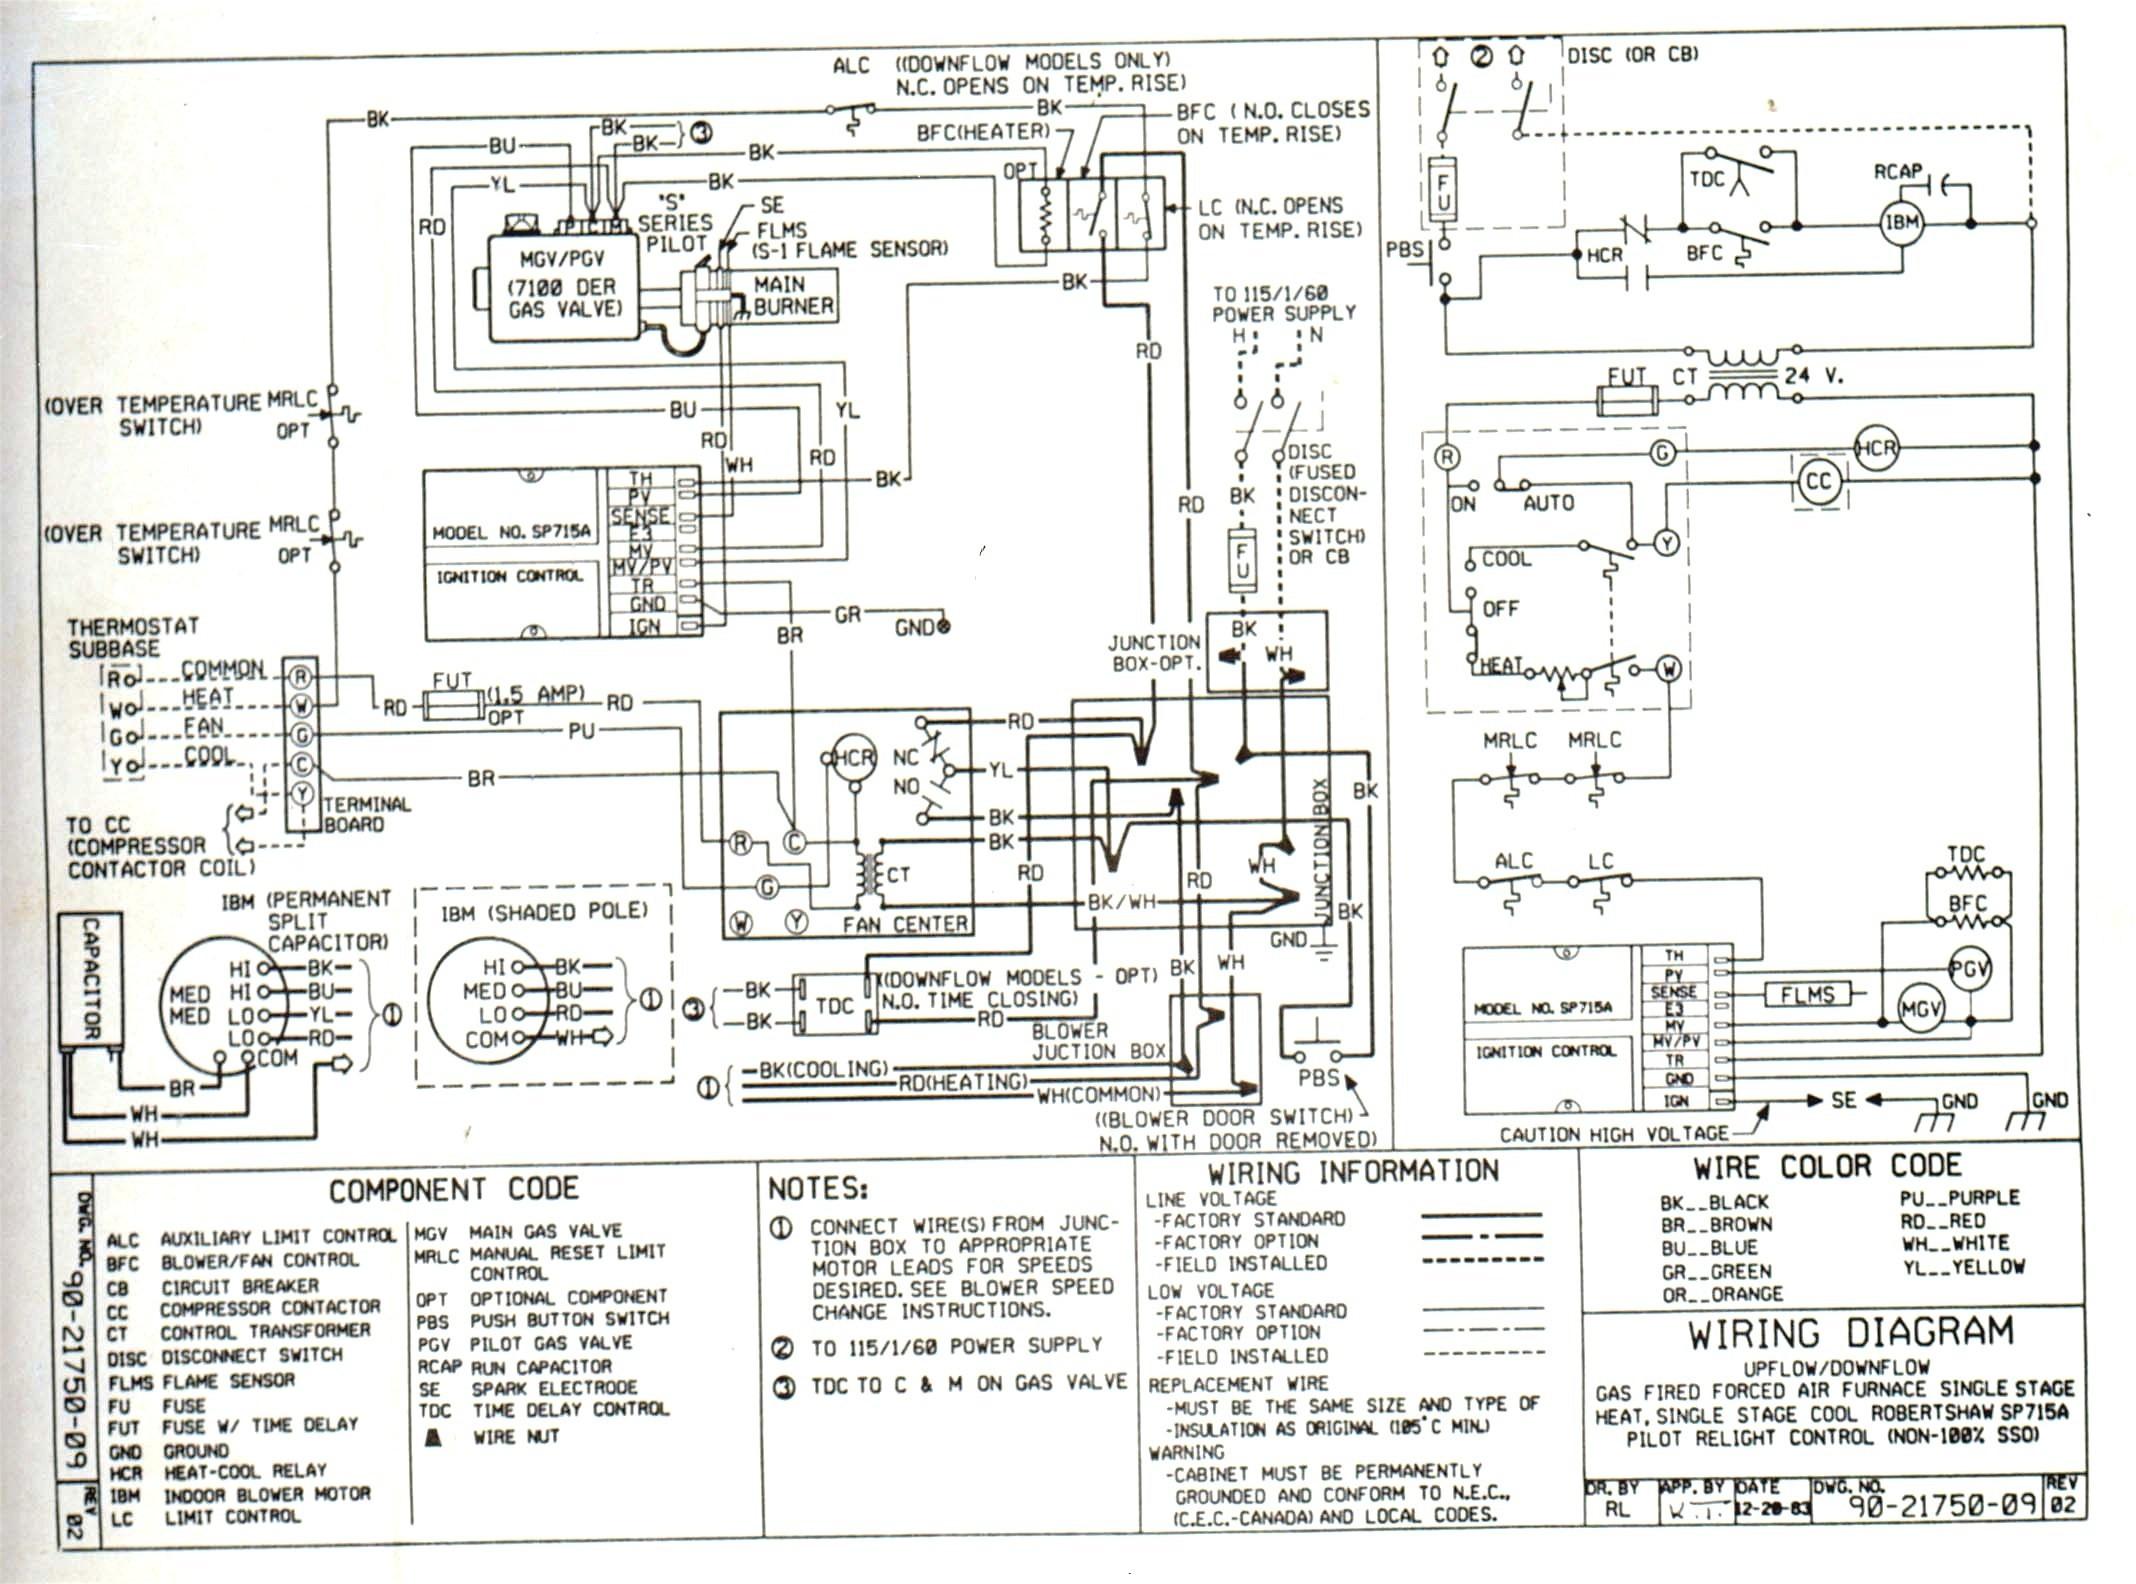 Honeywell Gas Valve Wiring Diagram Look At The Wiring My Honeywell Gas